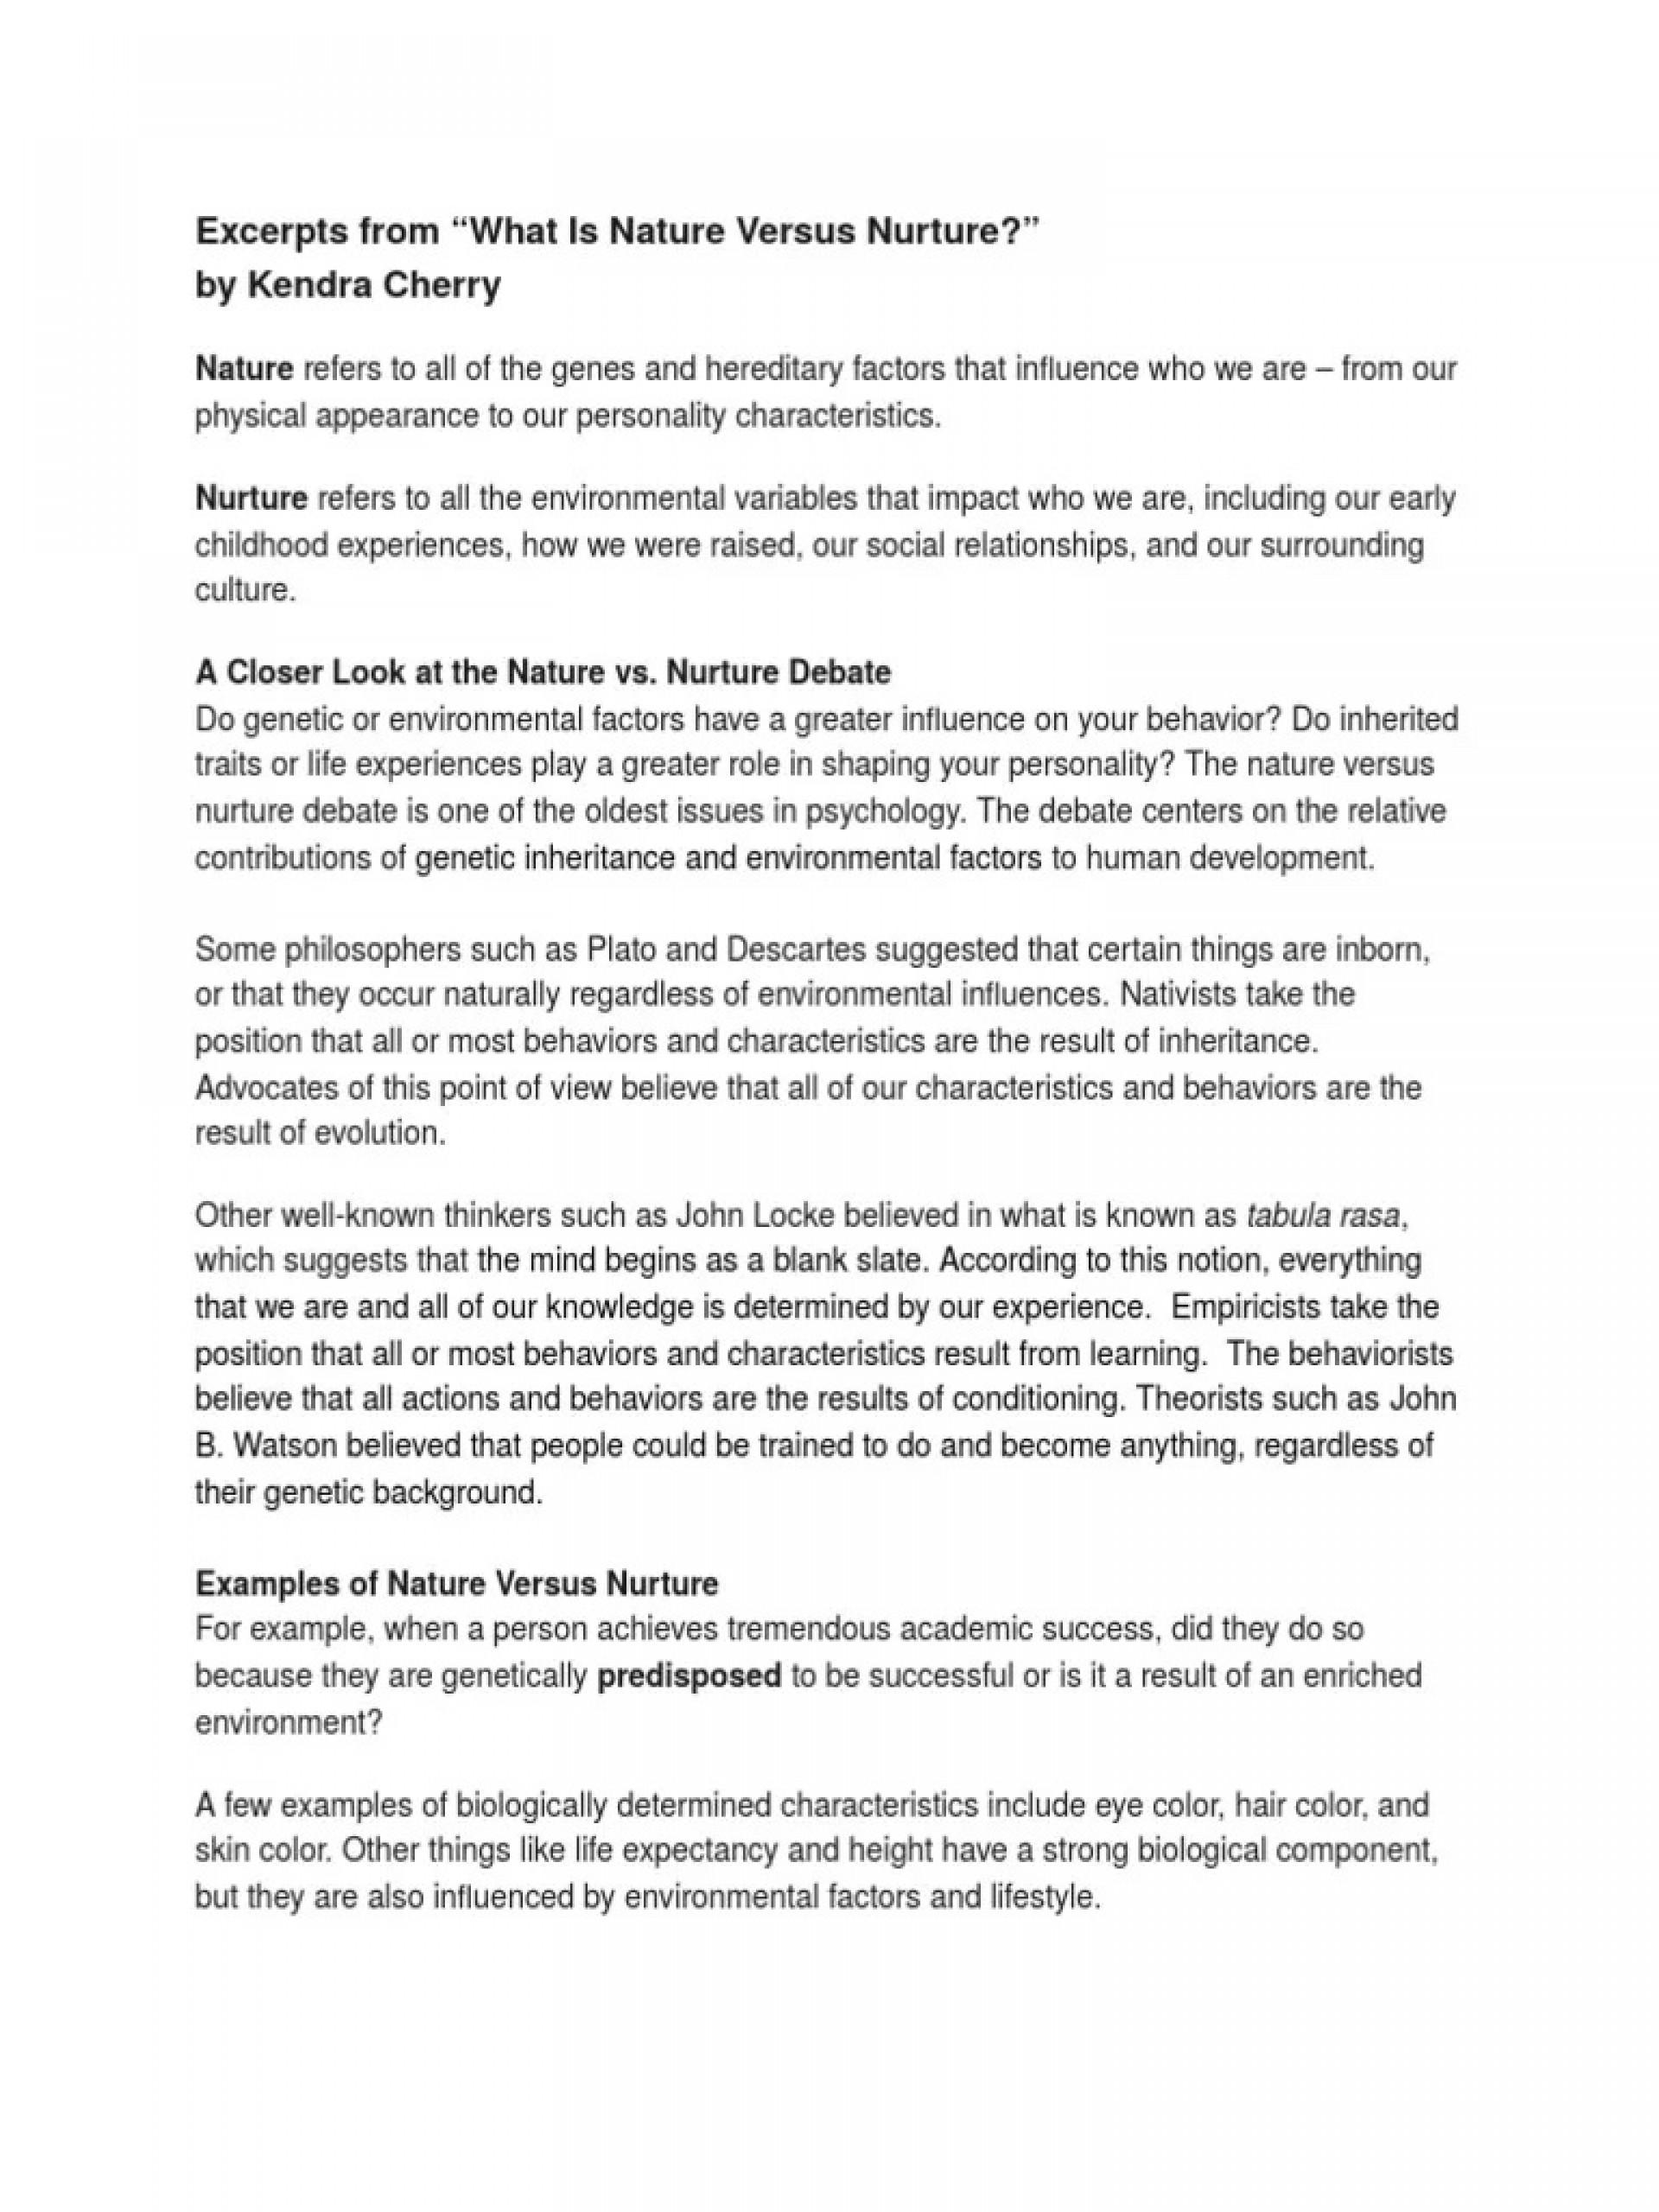 002 Top Nature V Nurture Essay Inspiration  Vs Plan Versu Psychology Pdf1920